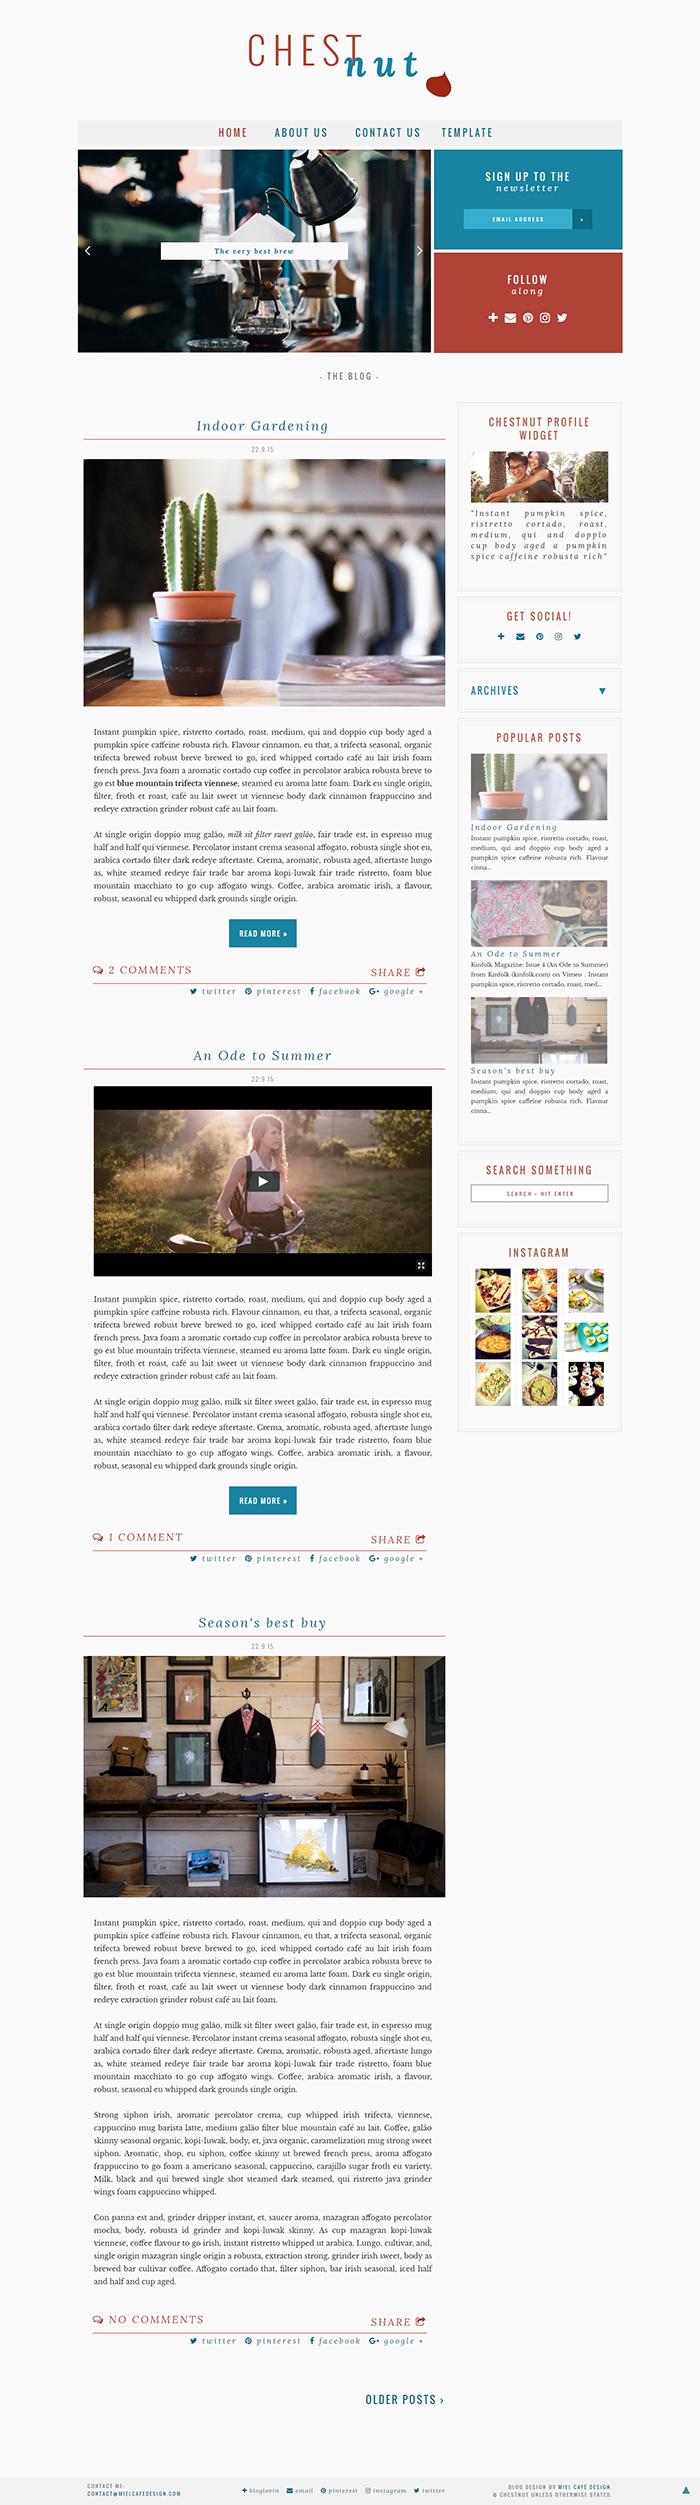 Chestnut Semi-Custom Blogger Template - Miel Café Design